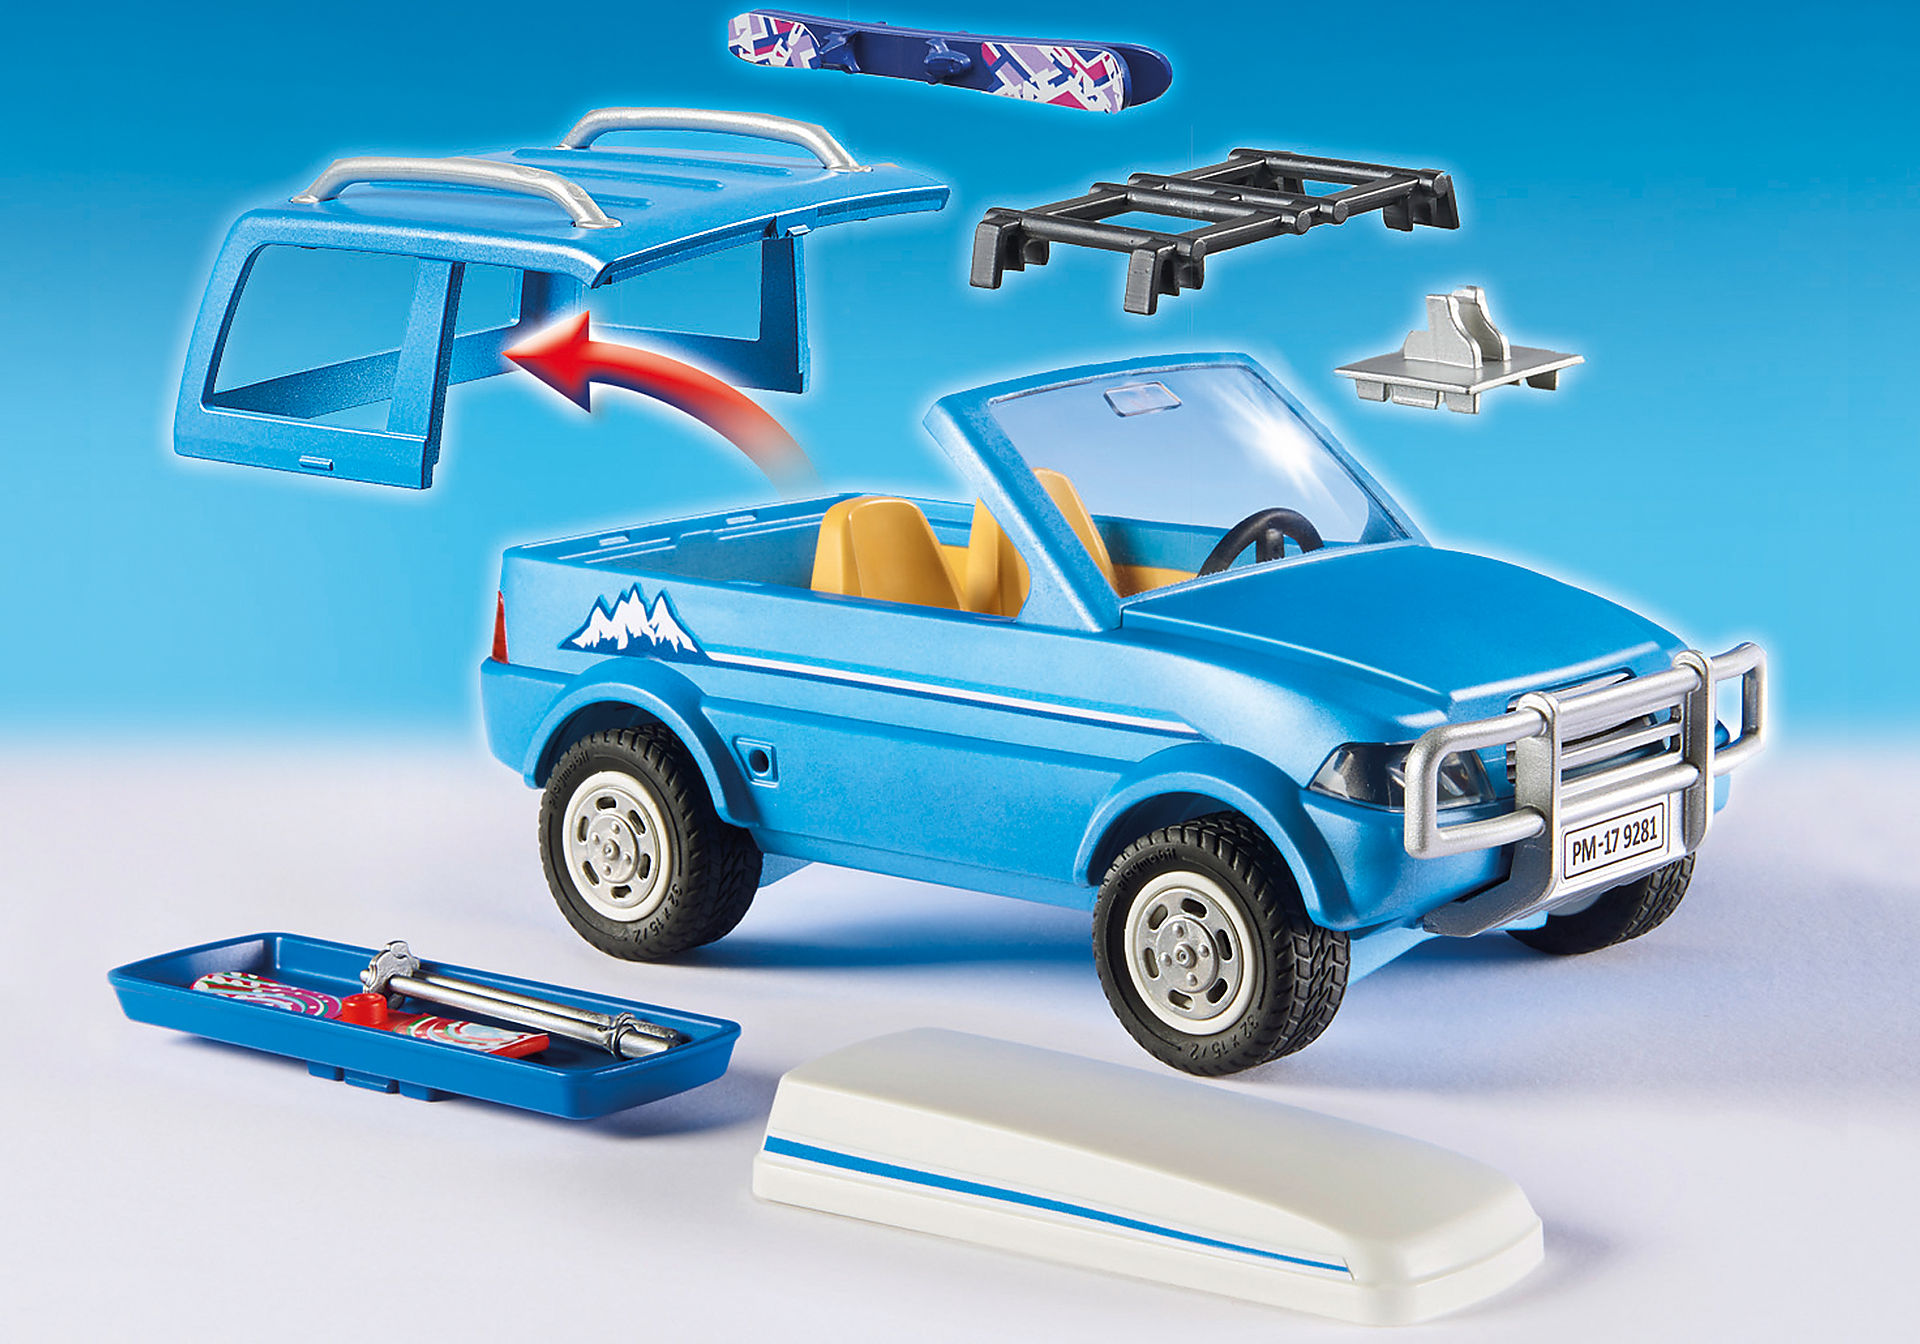 http://media.playmobil.com/i/playmobil/9281_product_extra3/Bil med takbox